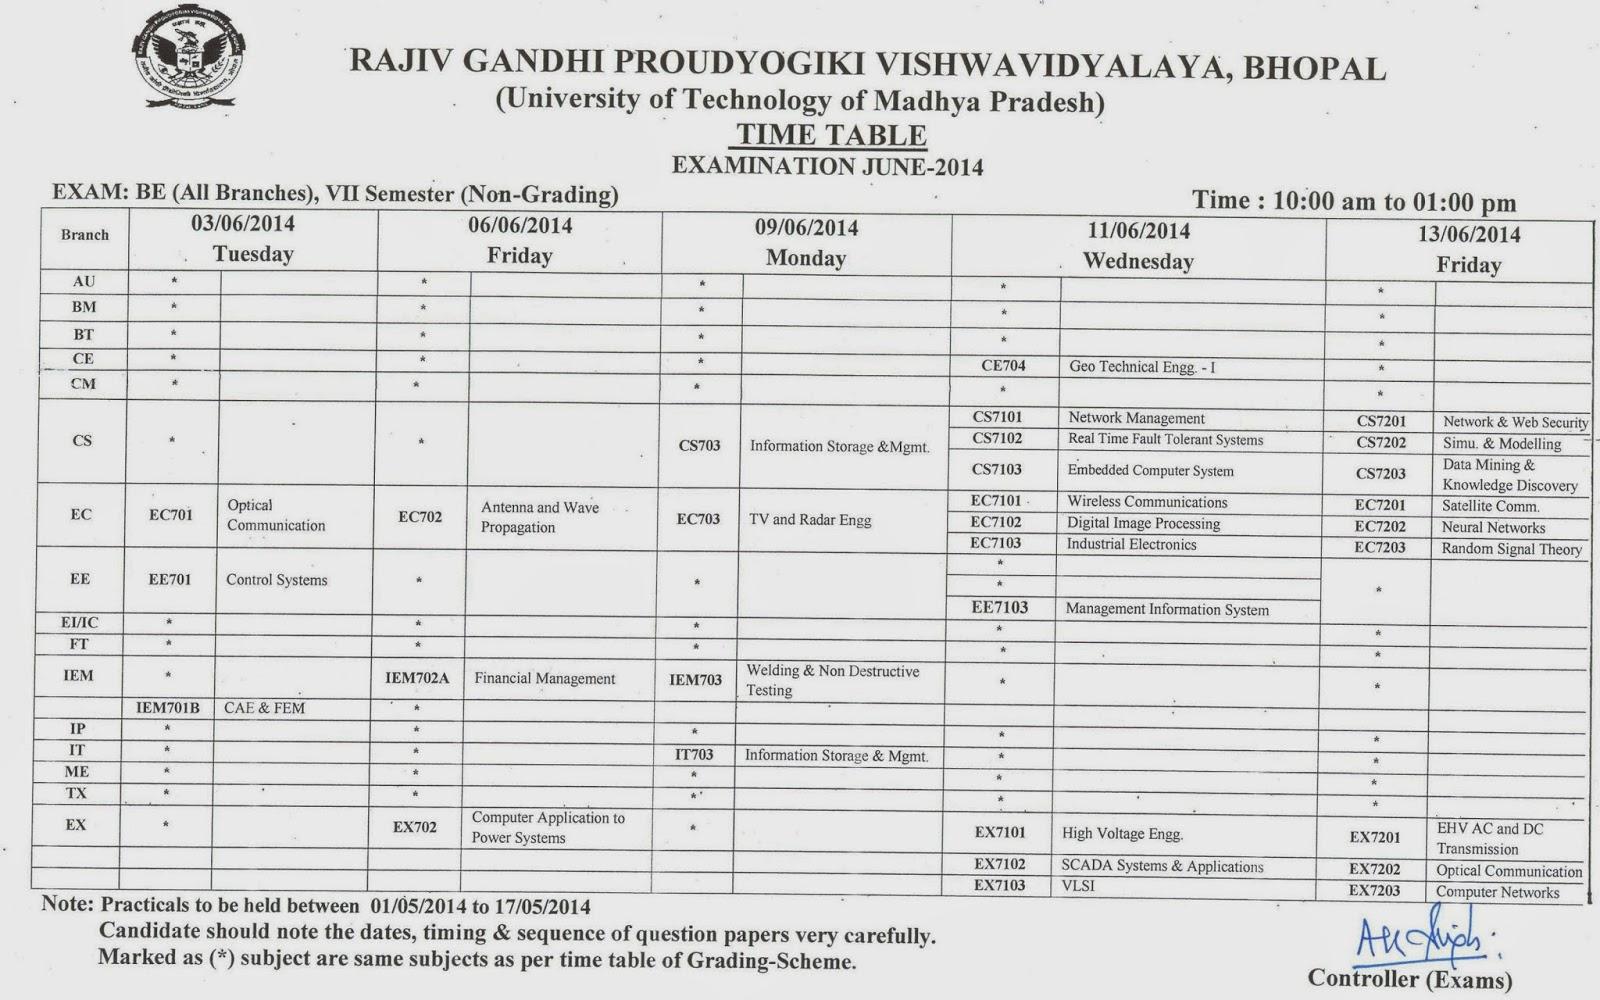 Rajiv gandhi proudyogiki vishwavidyalaya rgpv b e 7th sem for Rgpv timetable 7th sem 2015